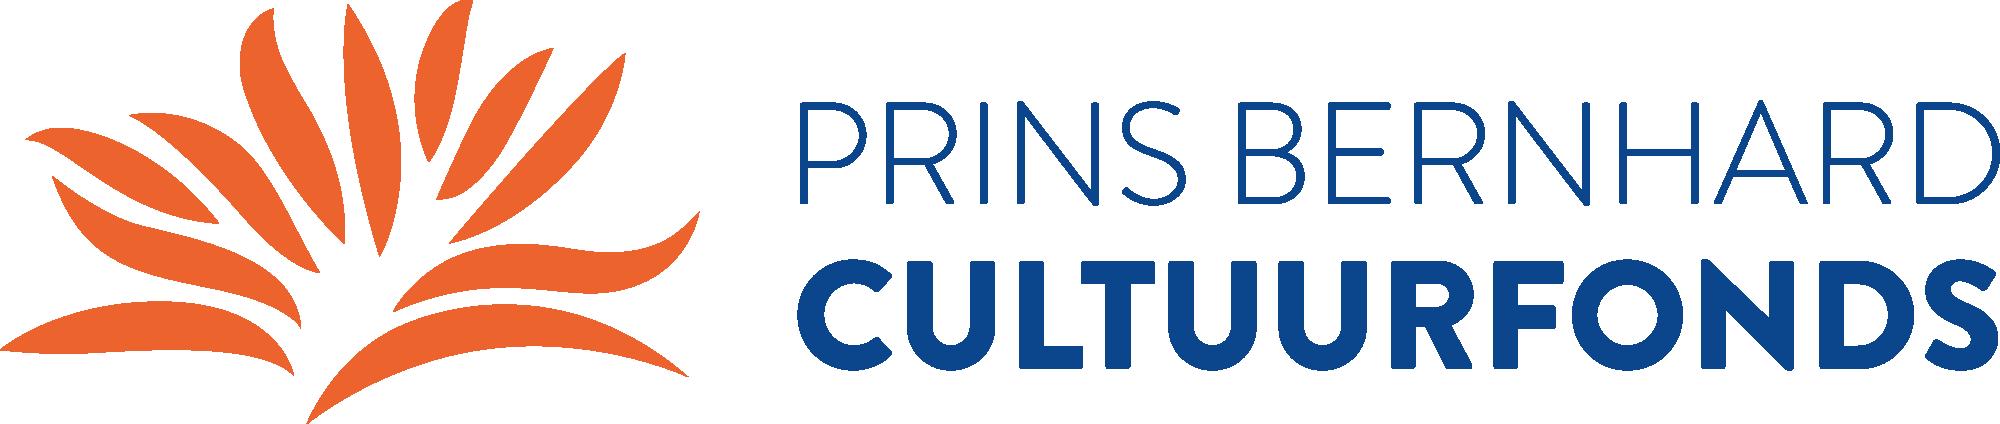 Prins Bernhard Cultuurfonds - horizontaal - full color